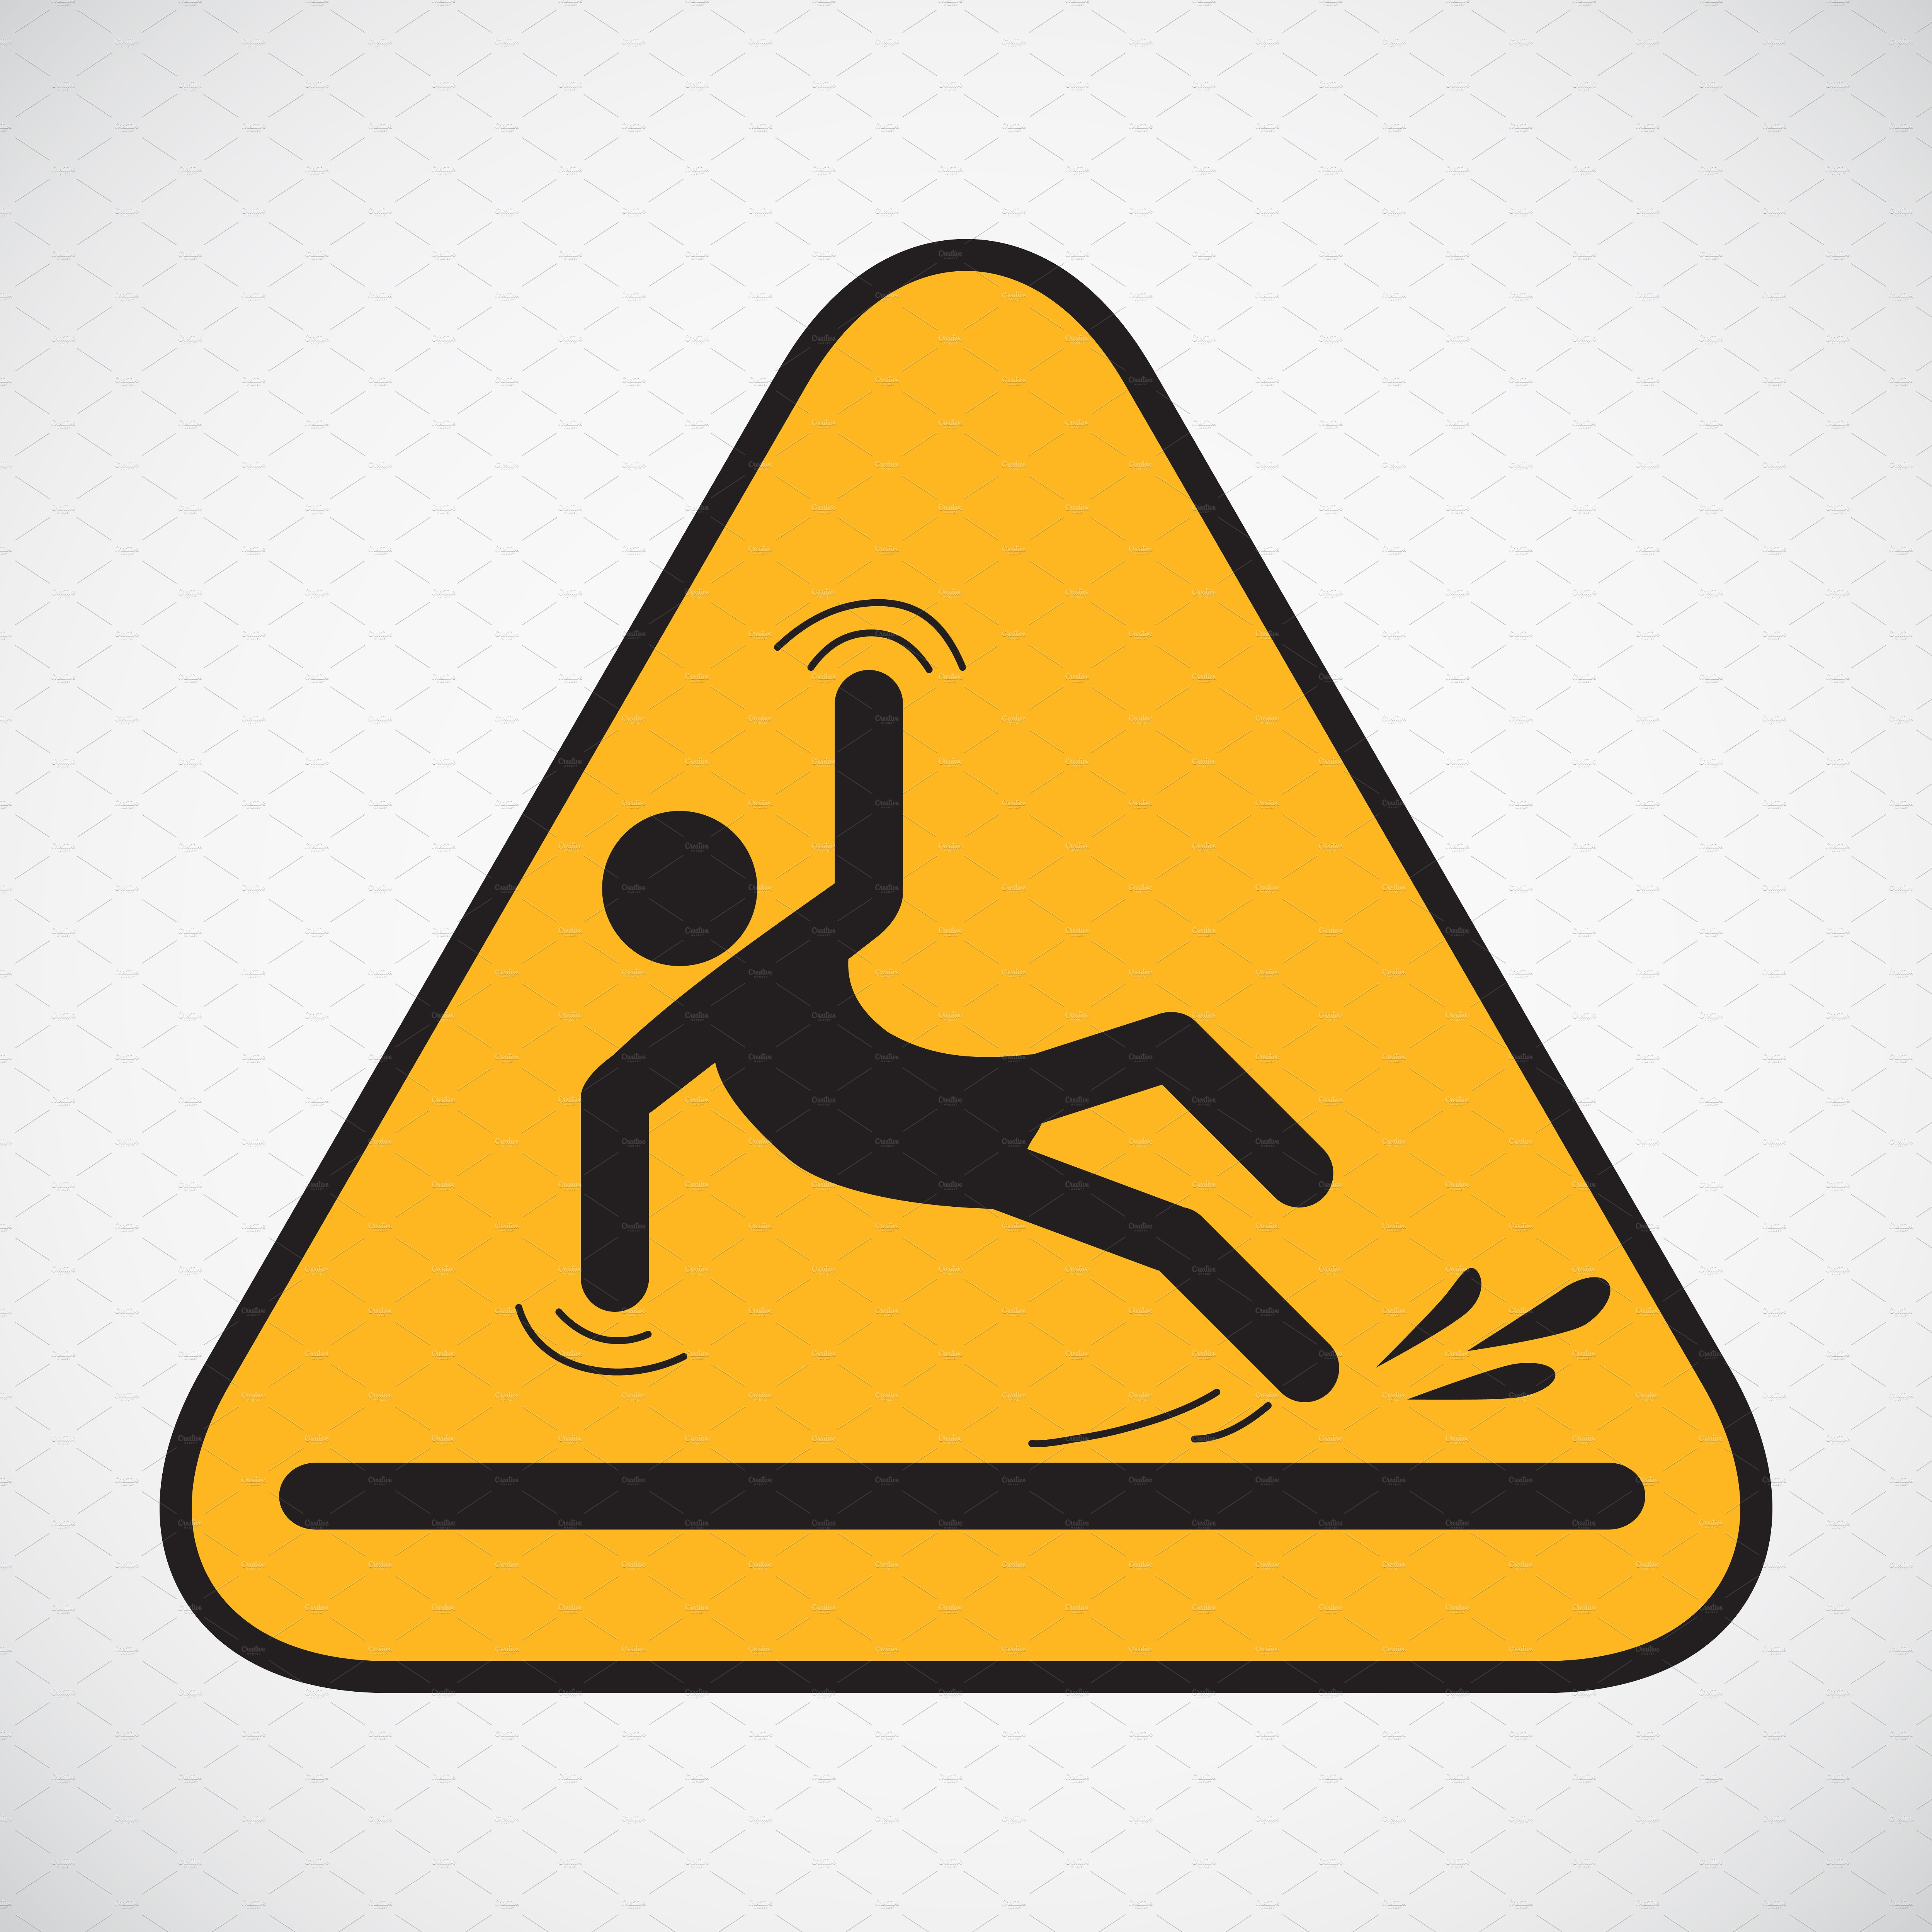 Wet floor caution sign. ~ Illustrations ~ Creative Market